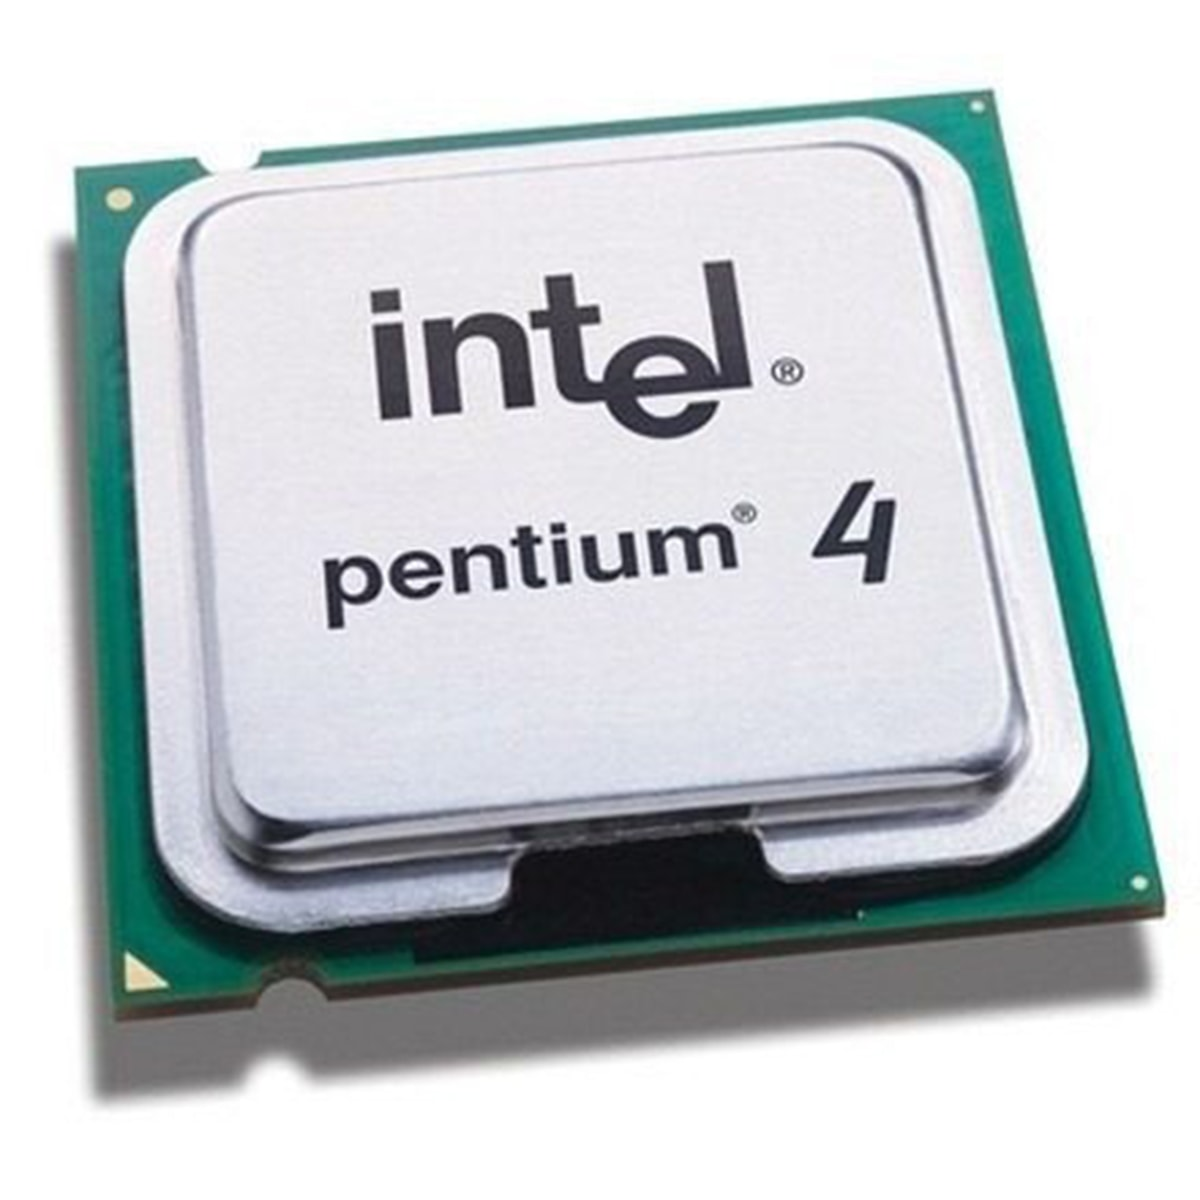 Processador Intel Pentium 4 HT 524 1M Cache / 3.06 GHz / 533 MHz / Socket 775 - Seminovo